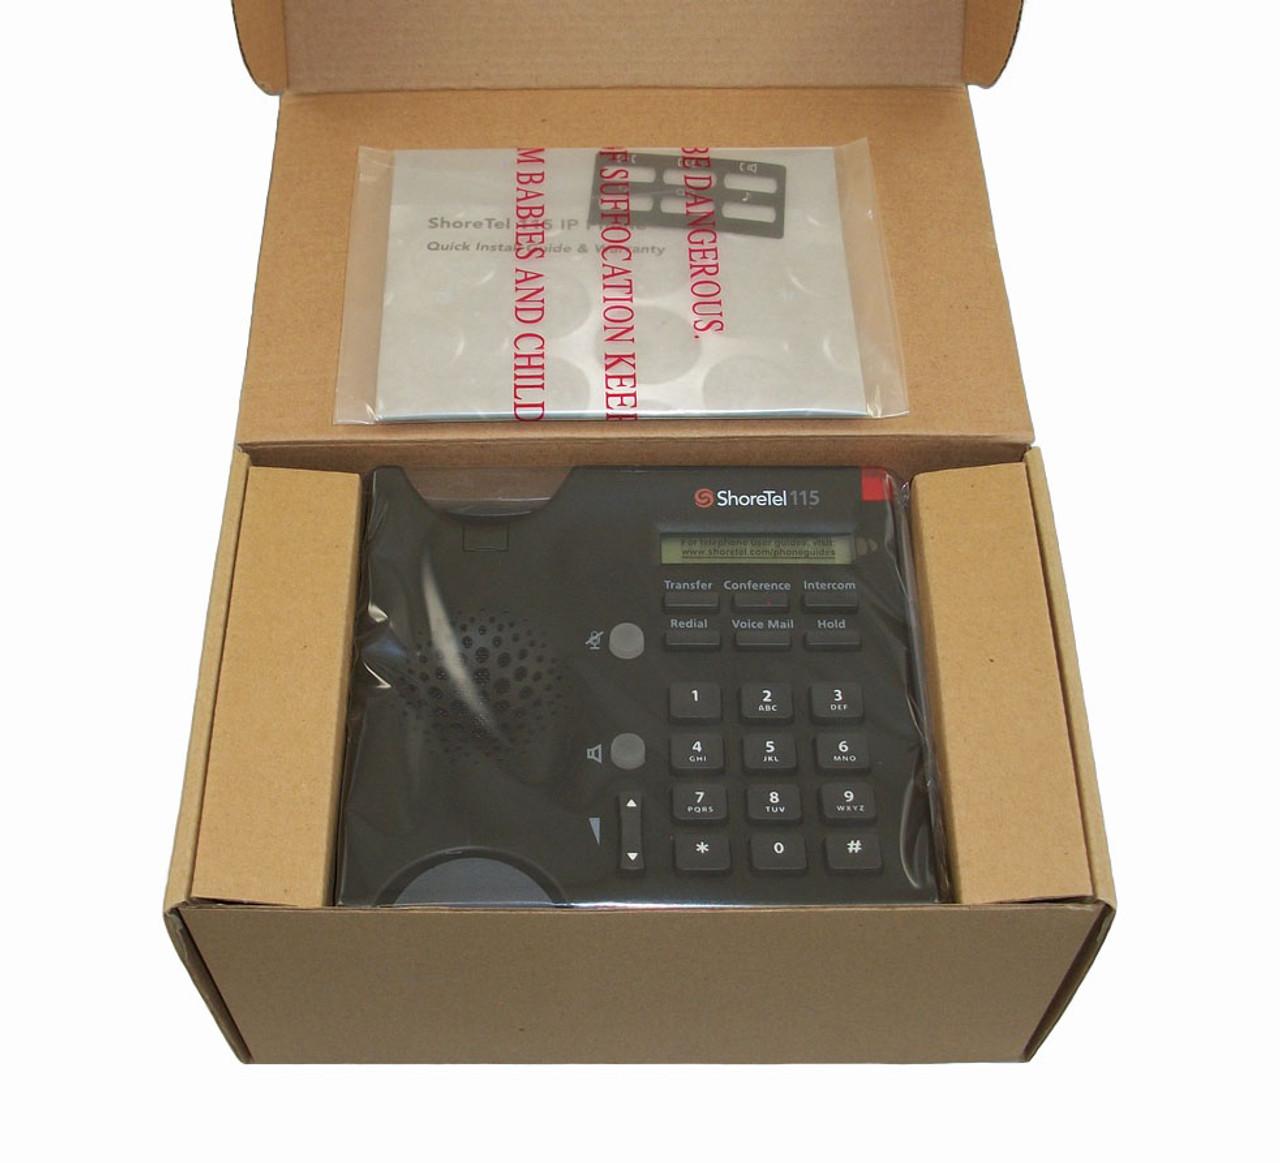 ShoreTel ShorePhone Model IP 115 VoIP Phone - 630-1035-11